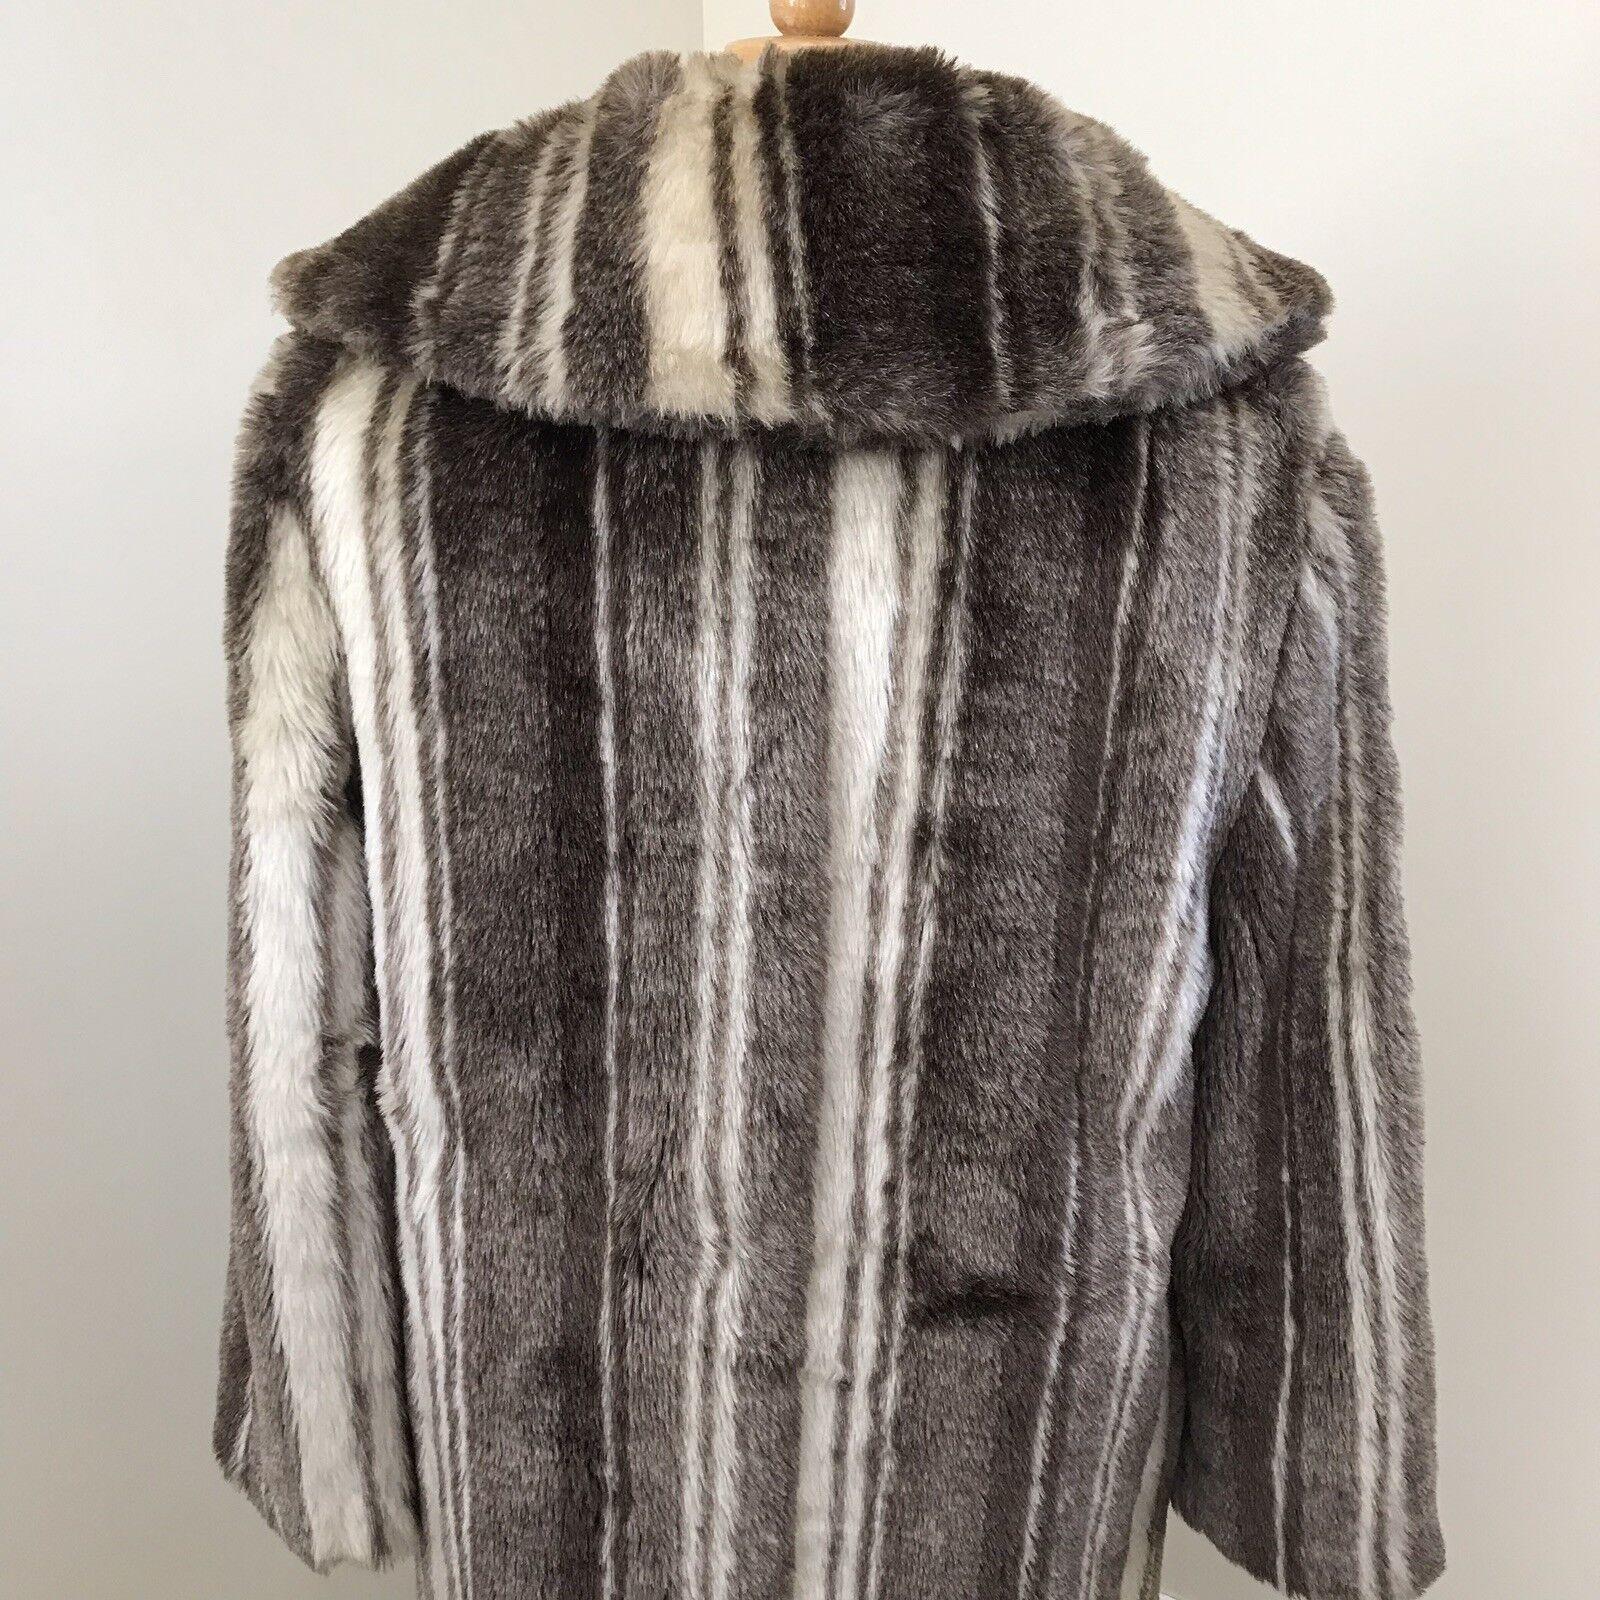 Vintage faux fur coat coat coat Brown & Cream ff9ff9